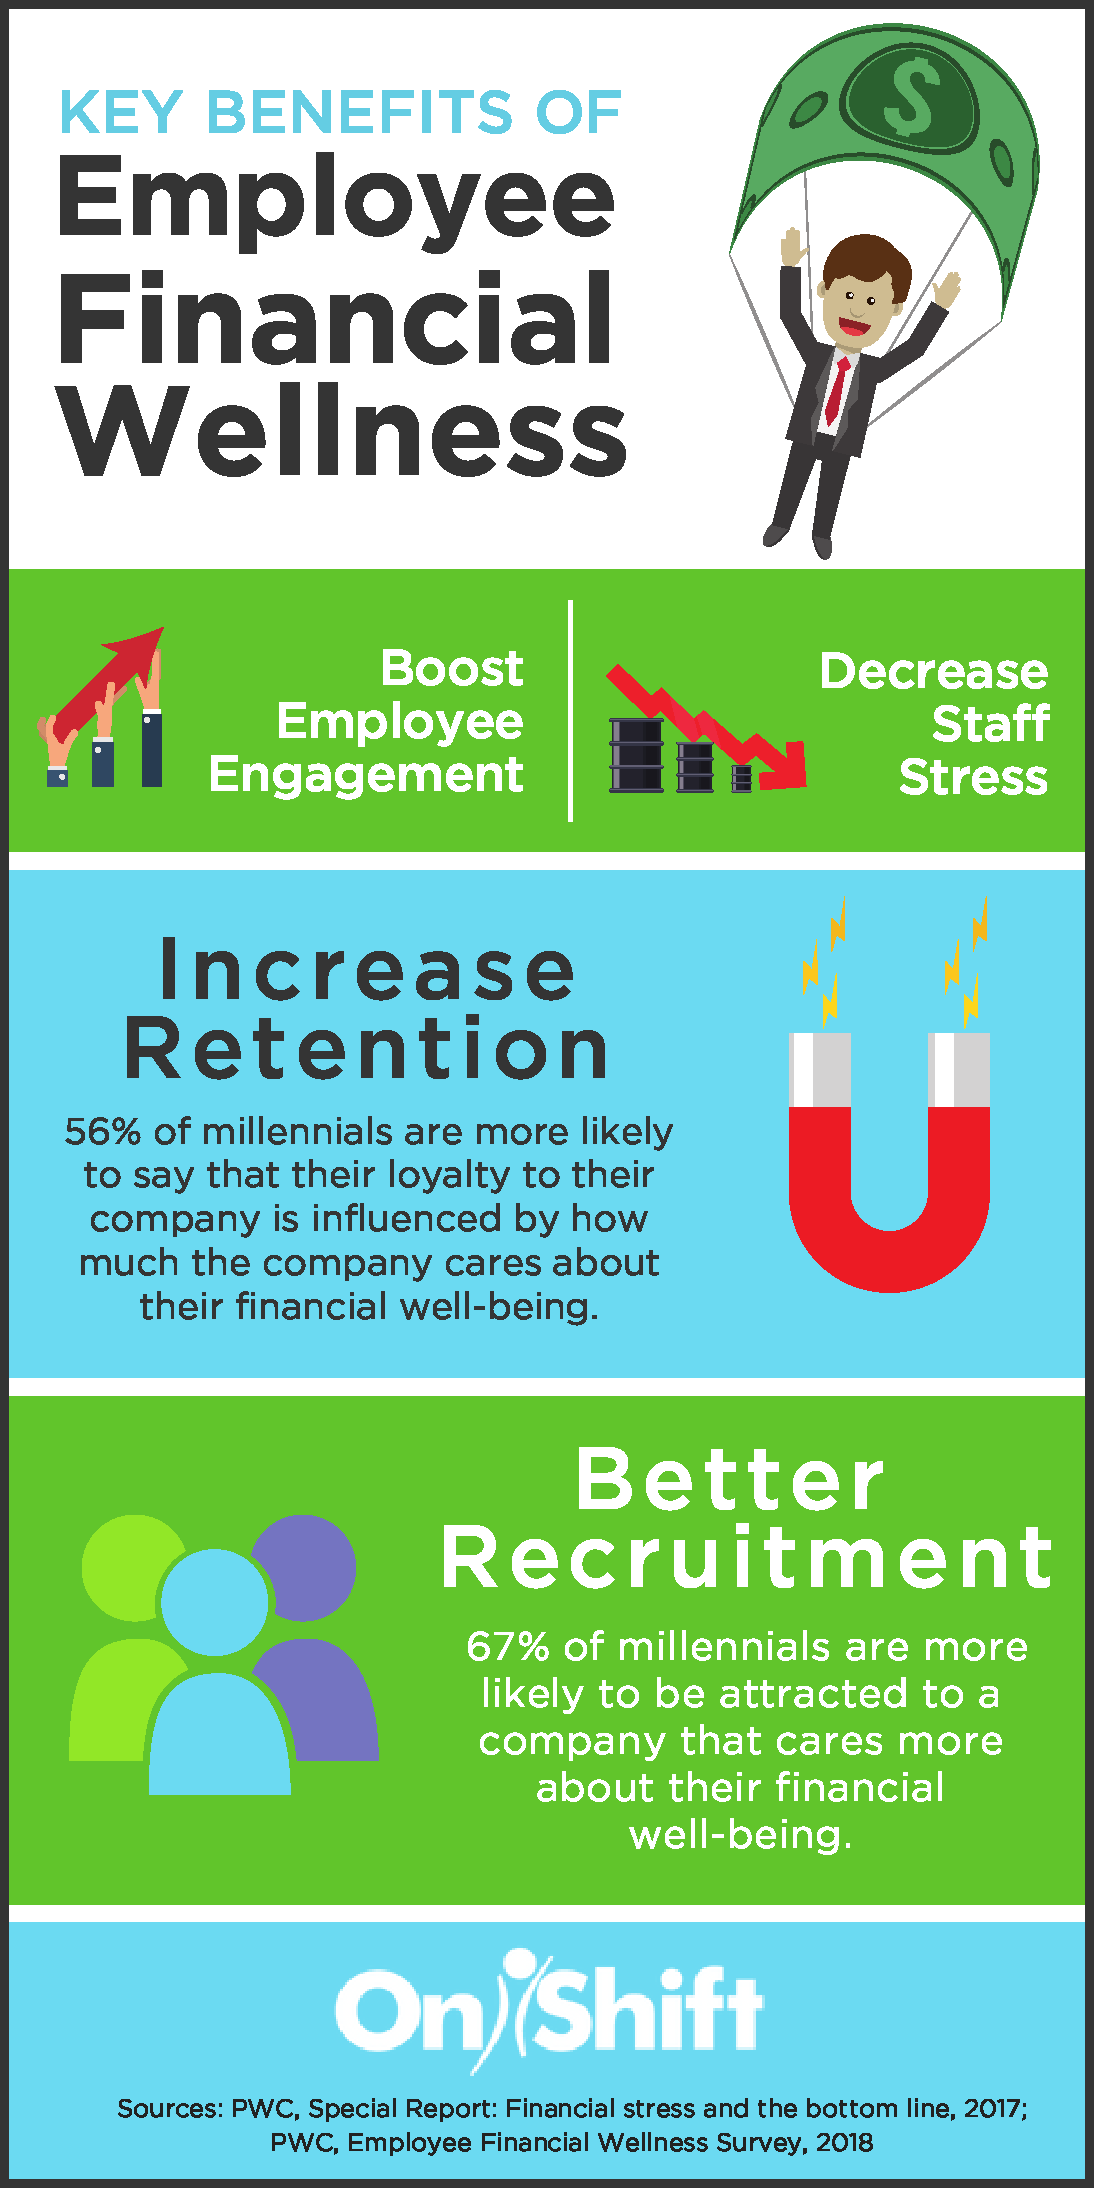 Key-Benefits-Of-Employee-Financial-Wellness